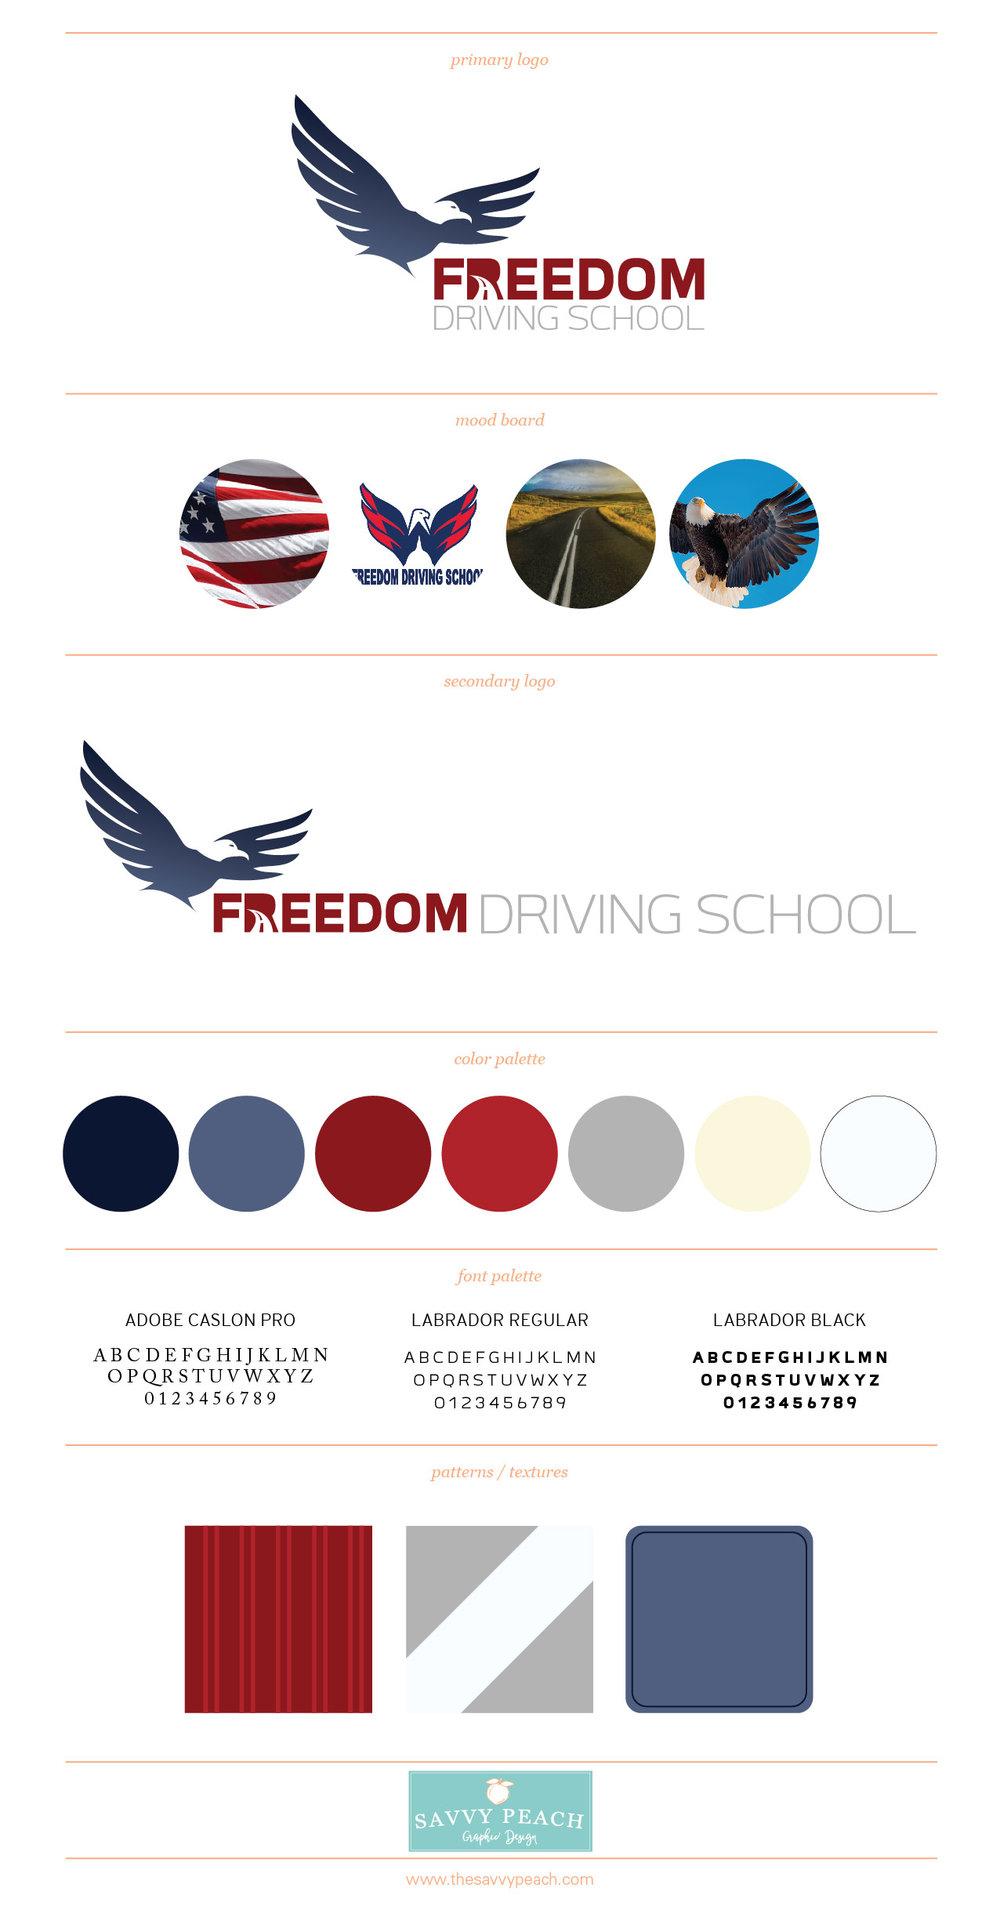 FreedomDriving